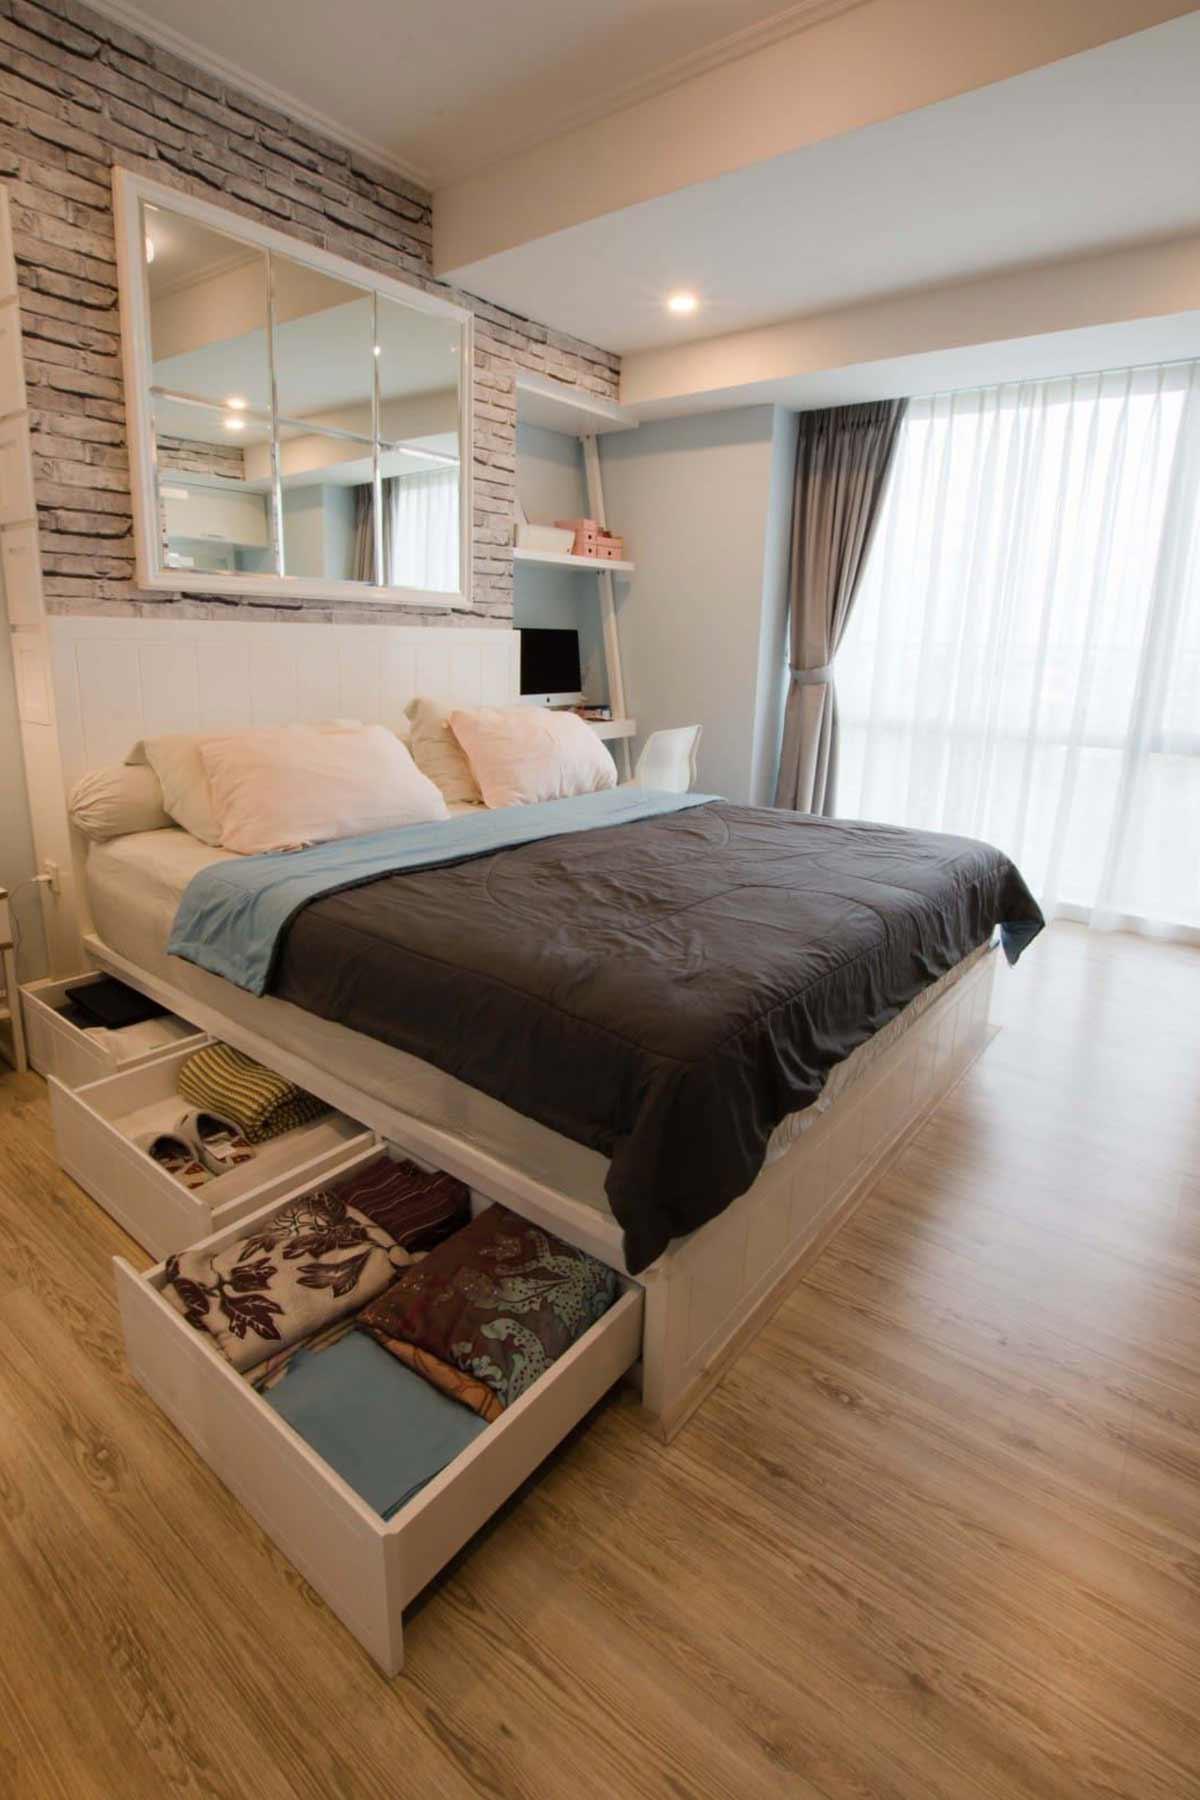 Apartemen sempit terasa lega